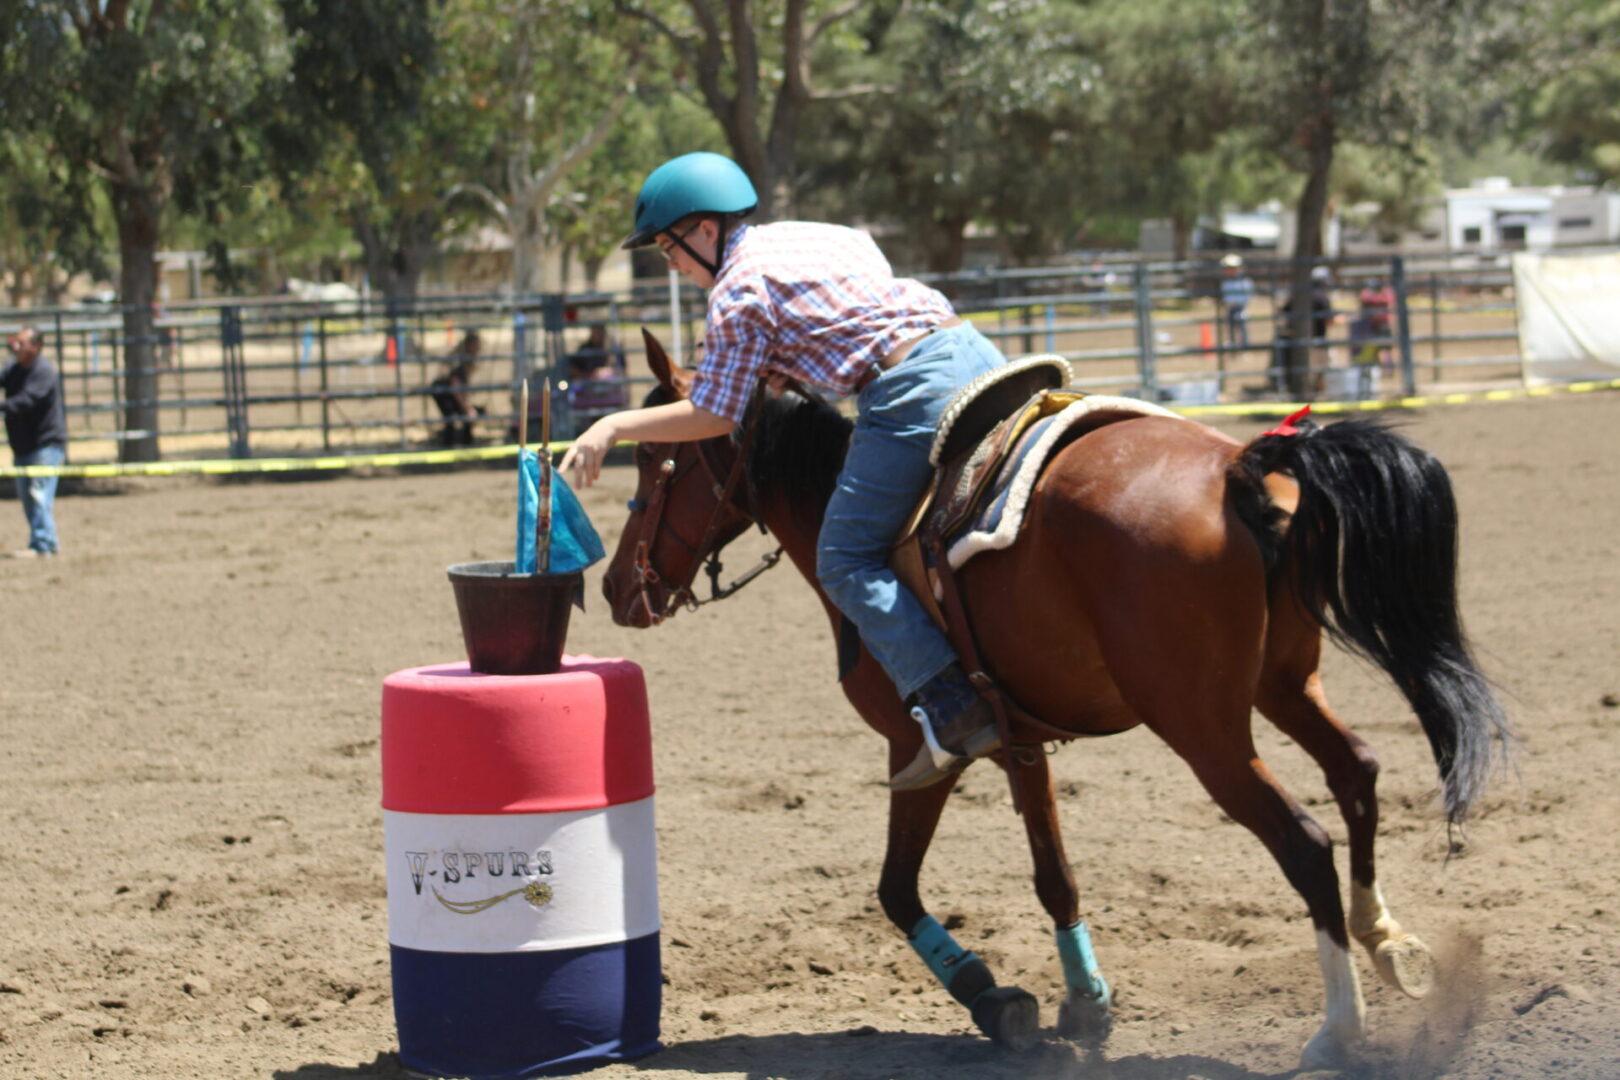 A person riding a brown horse